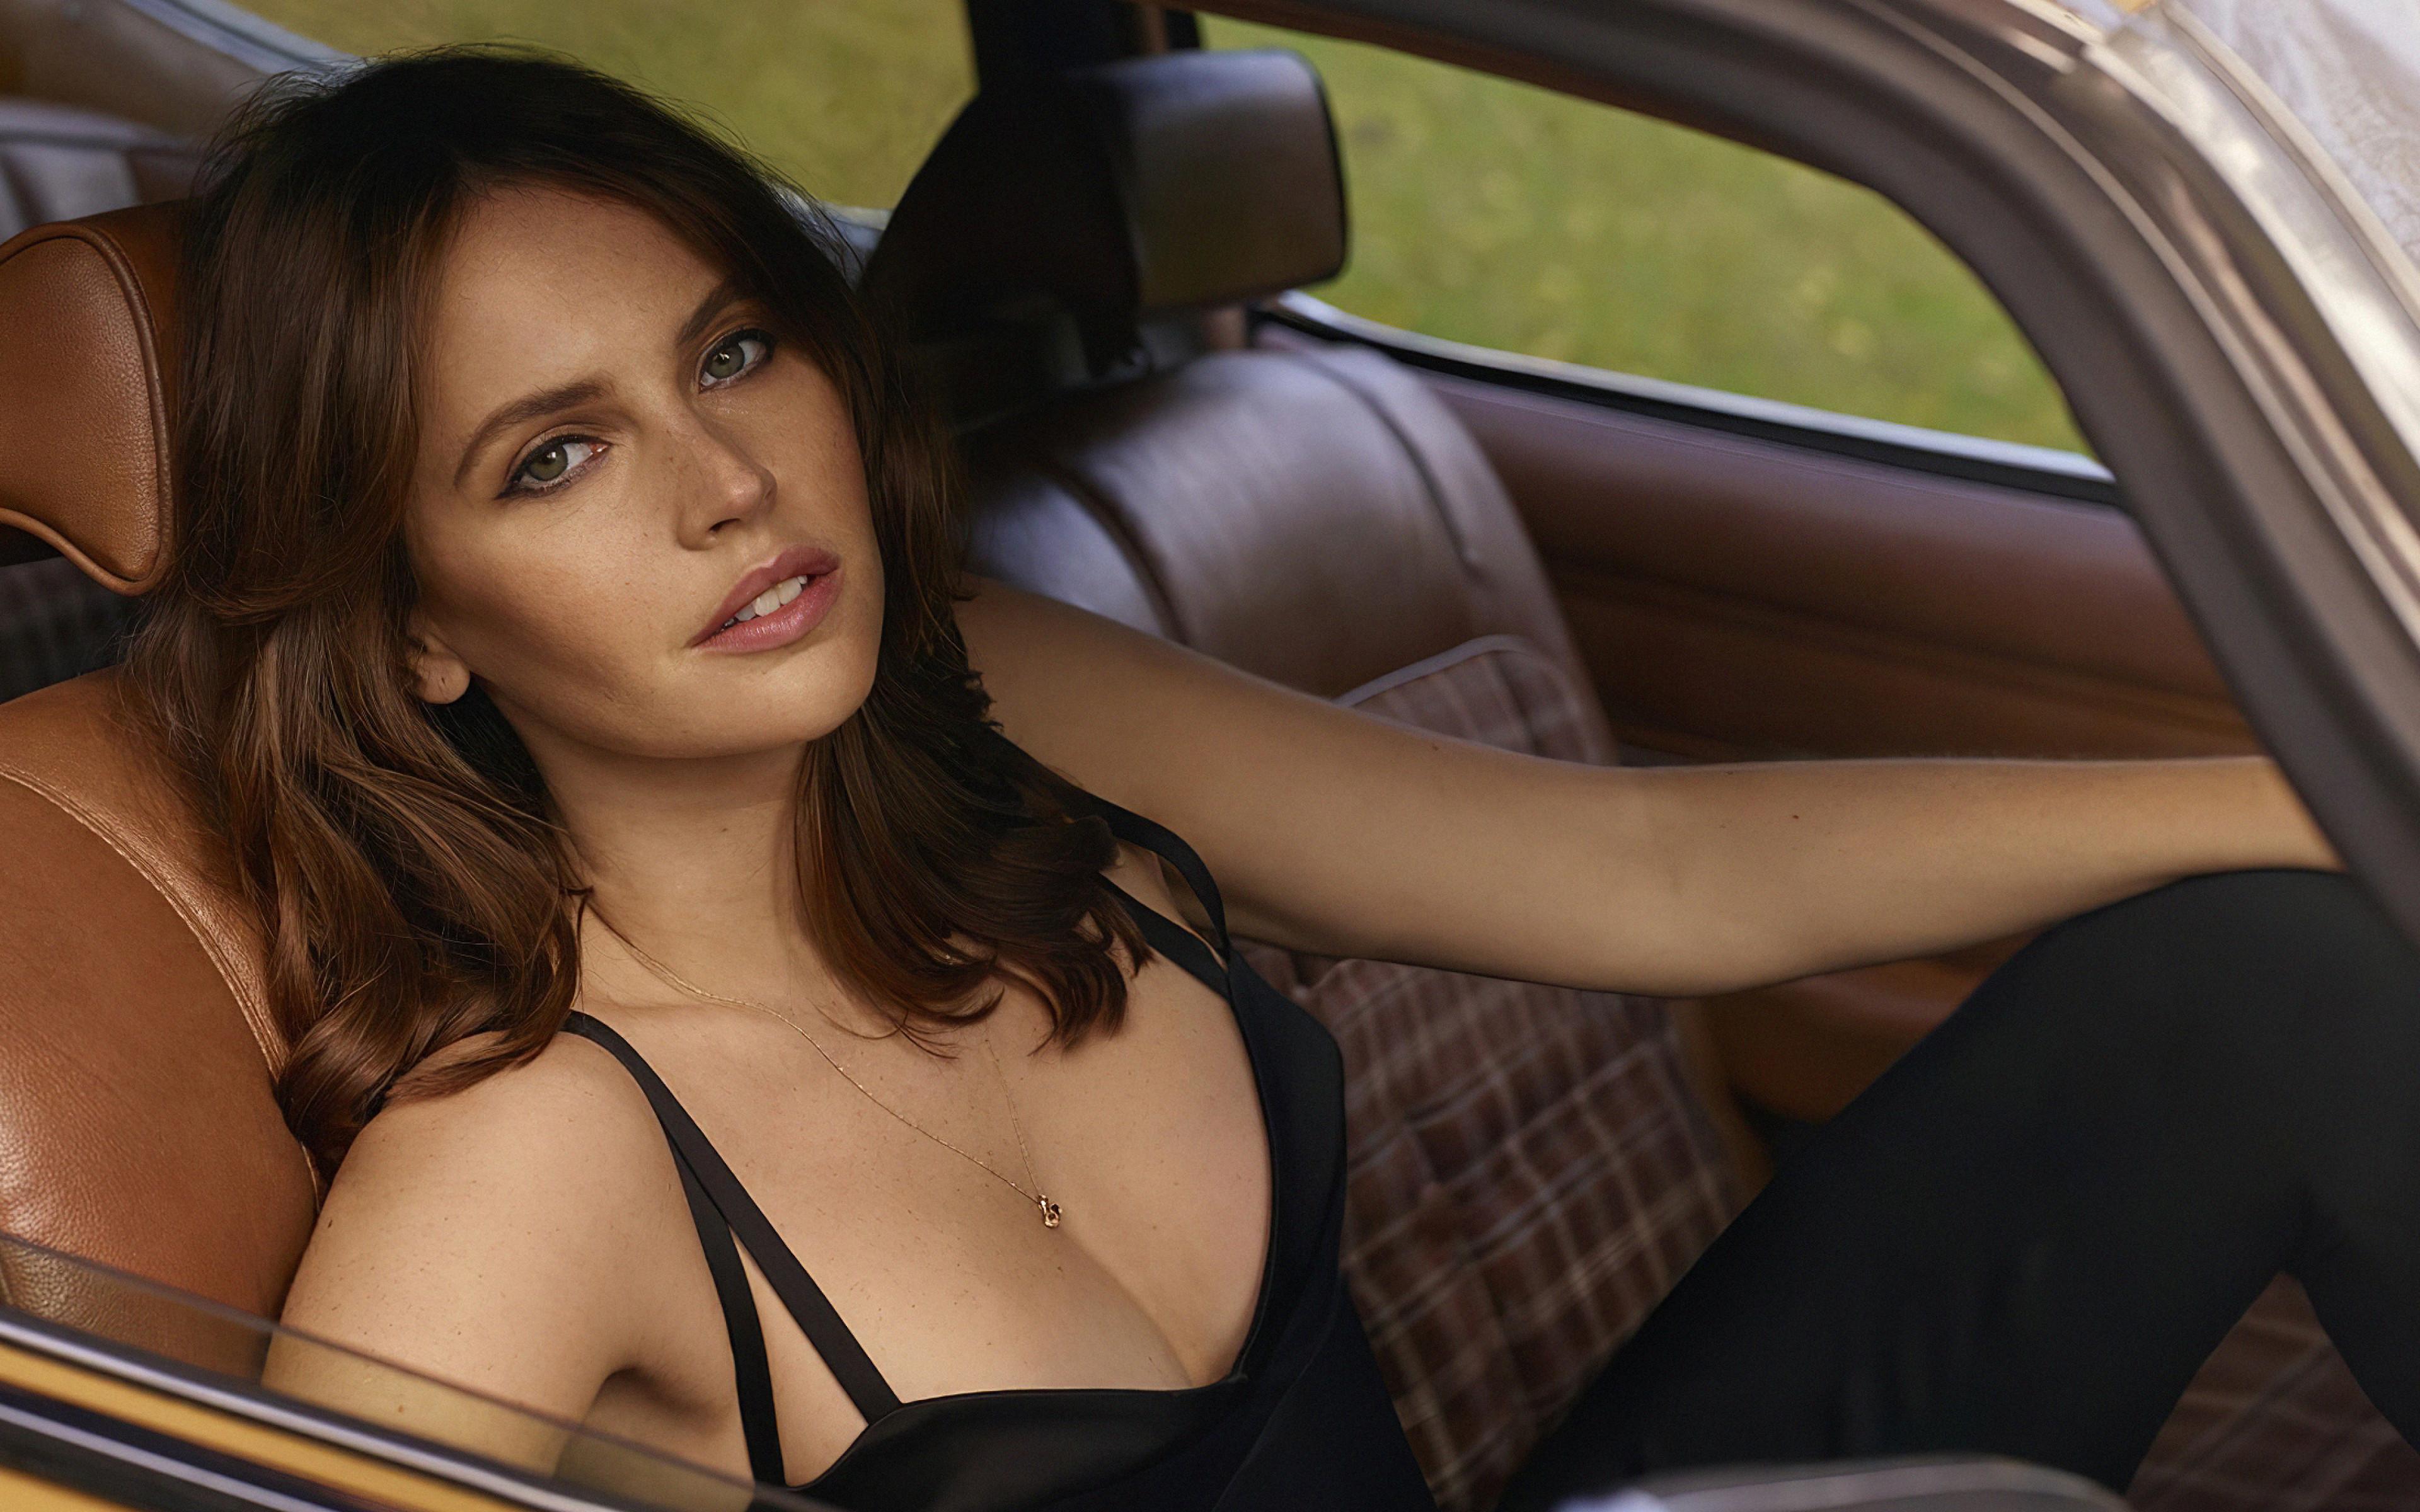 Fondos de pantalla Felicity Jones en un carro